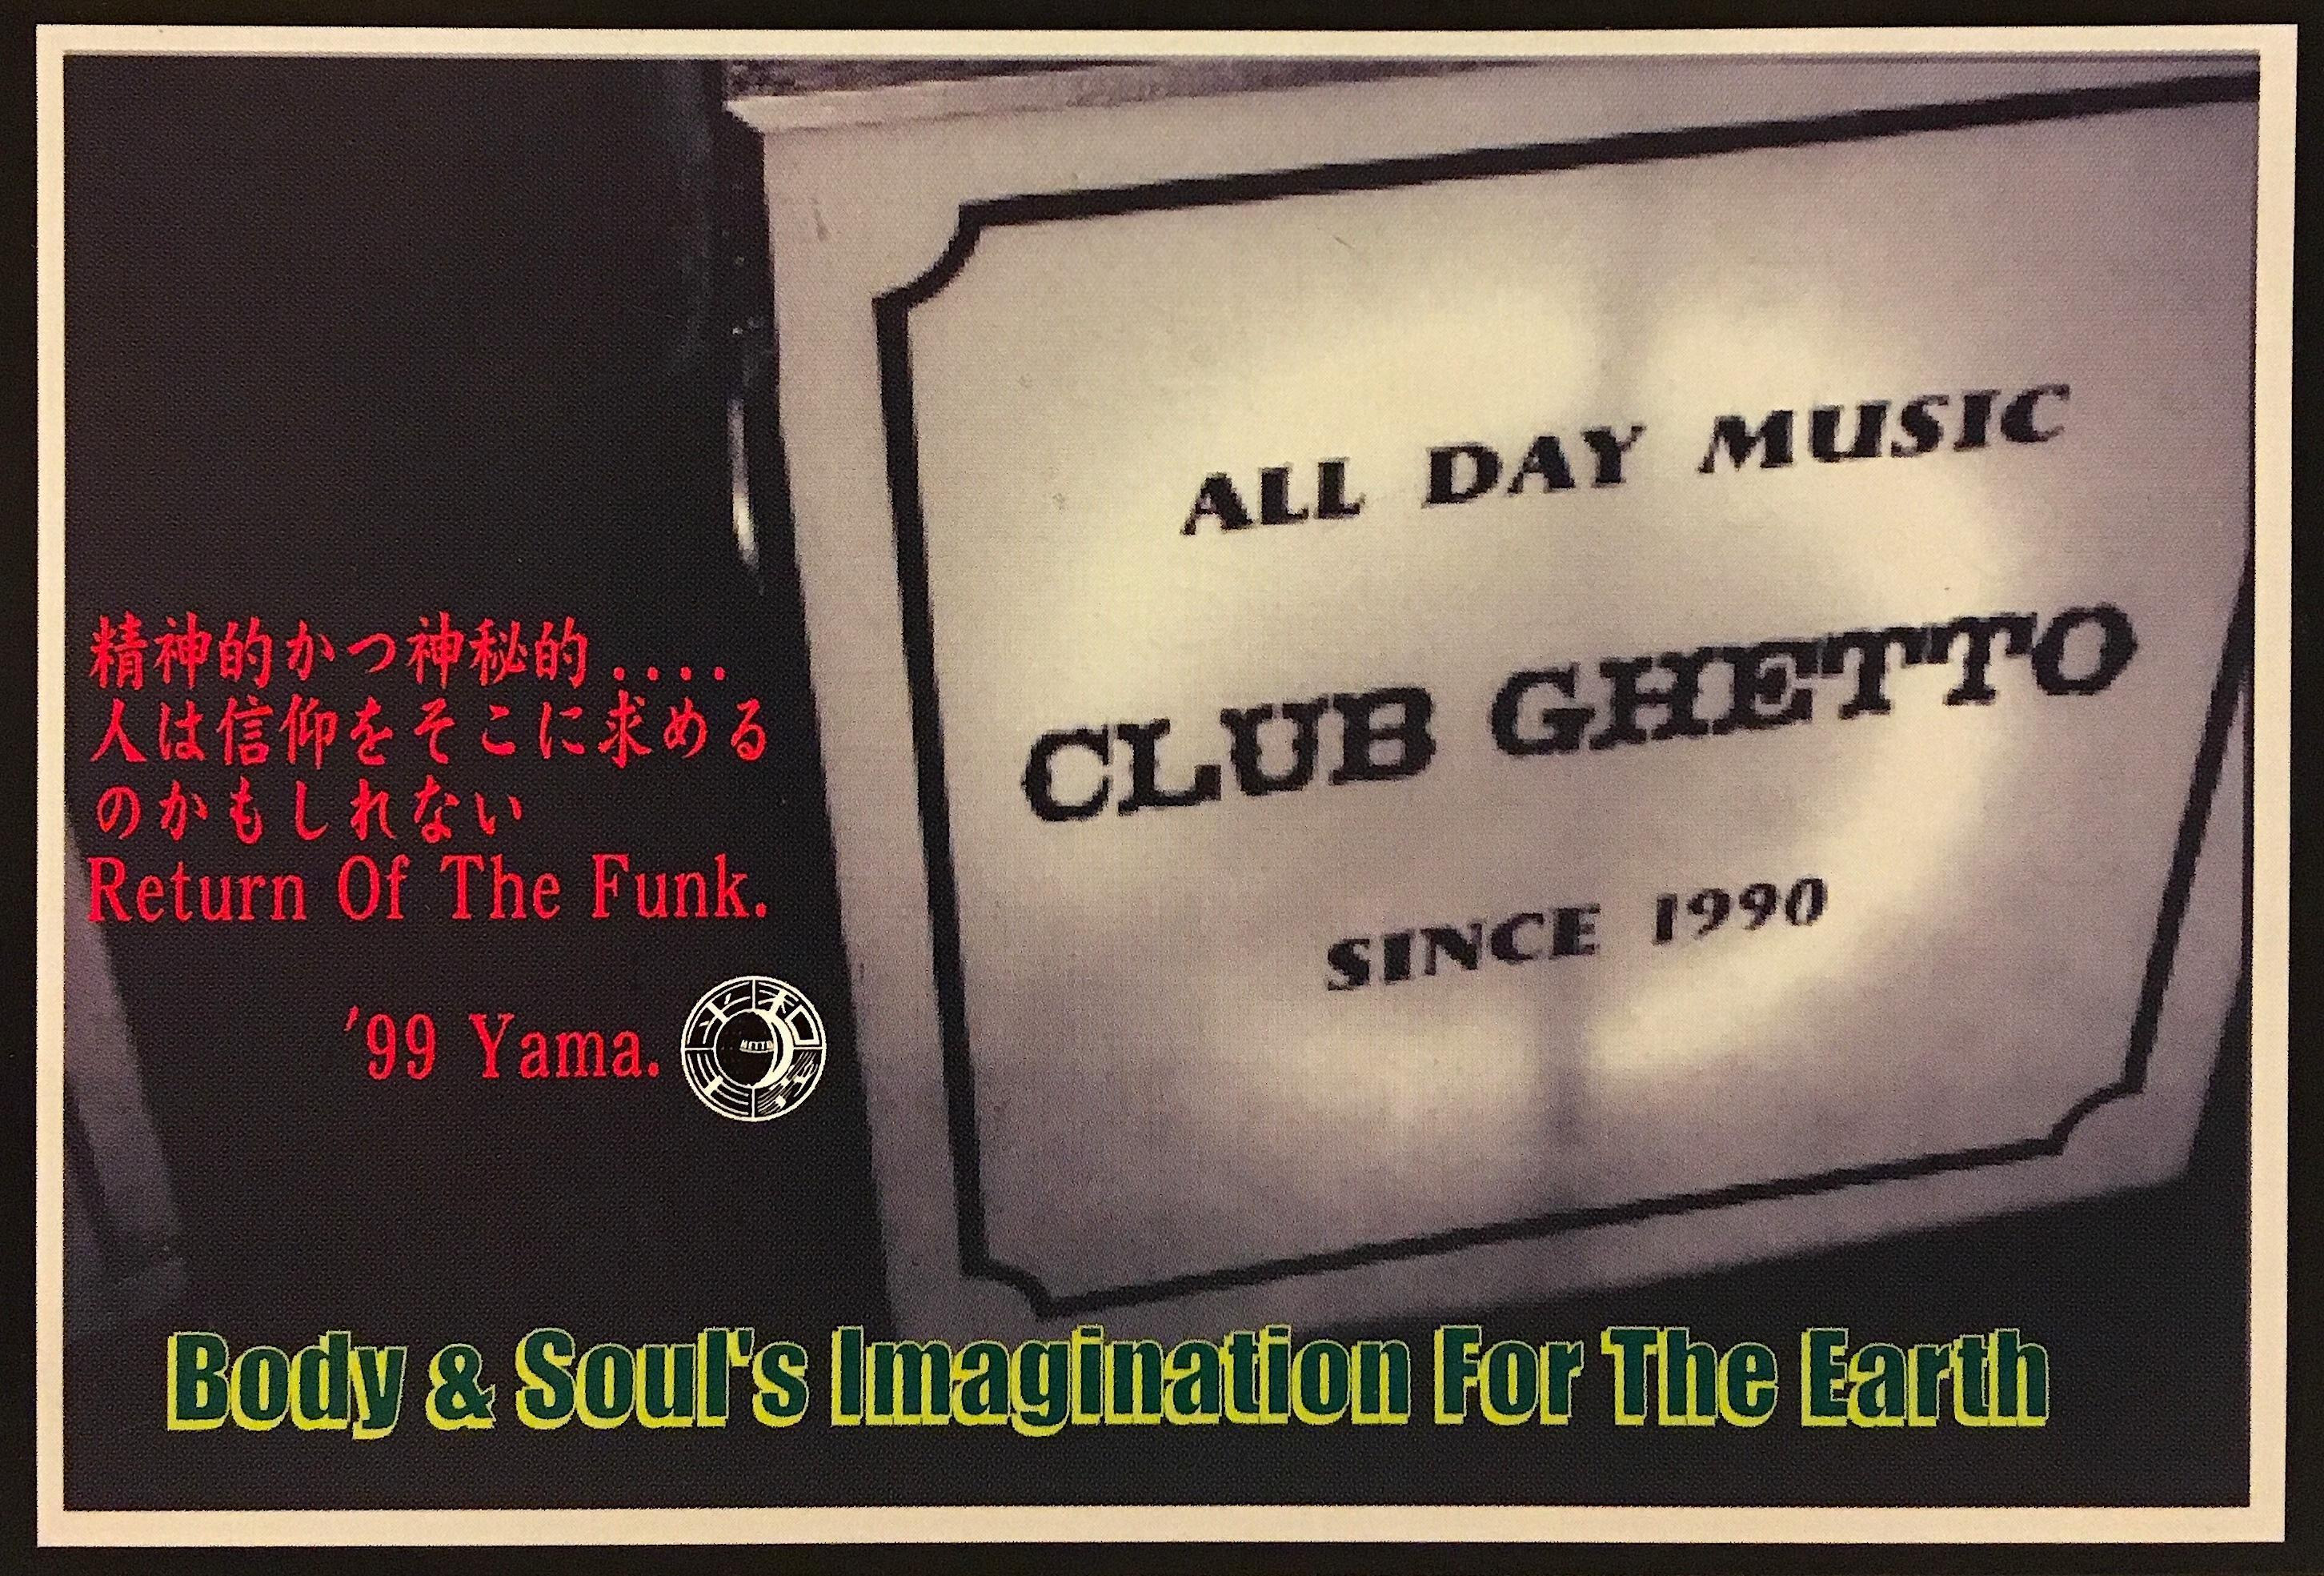 CLUB GHETTO 9th. ANNIVERSARY